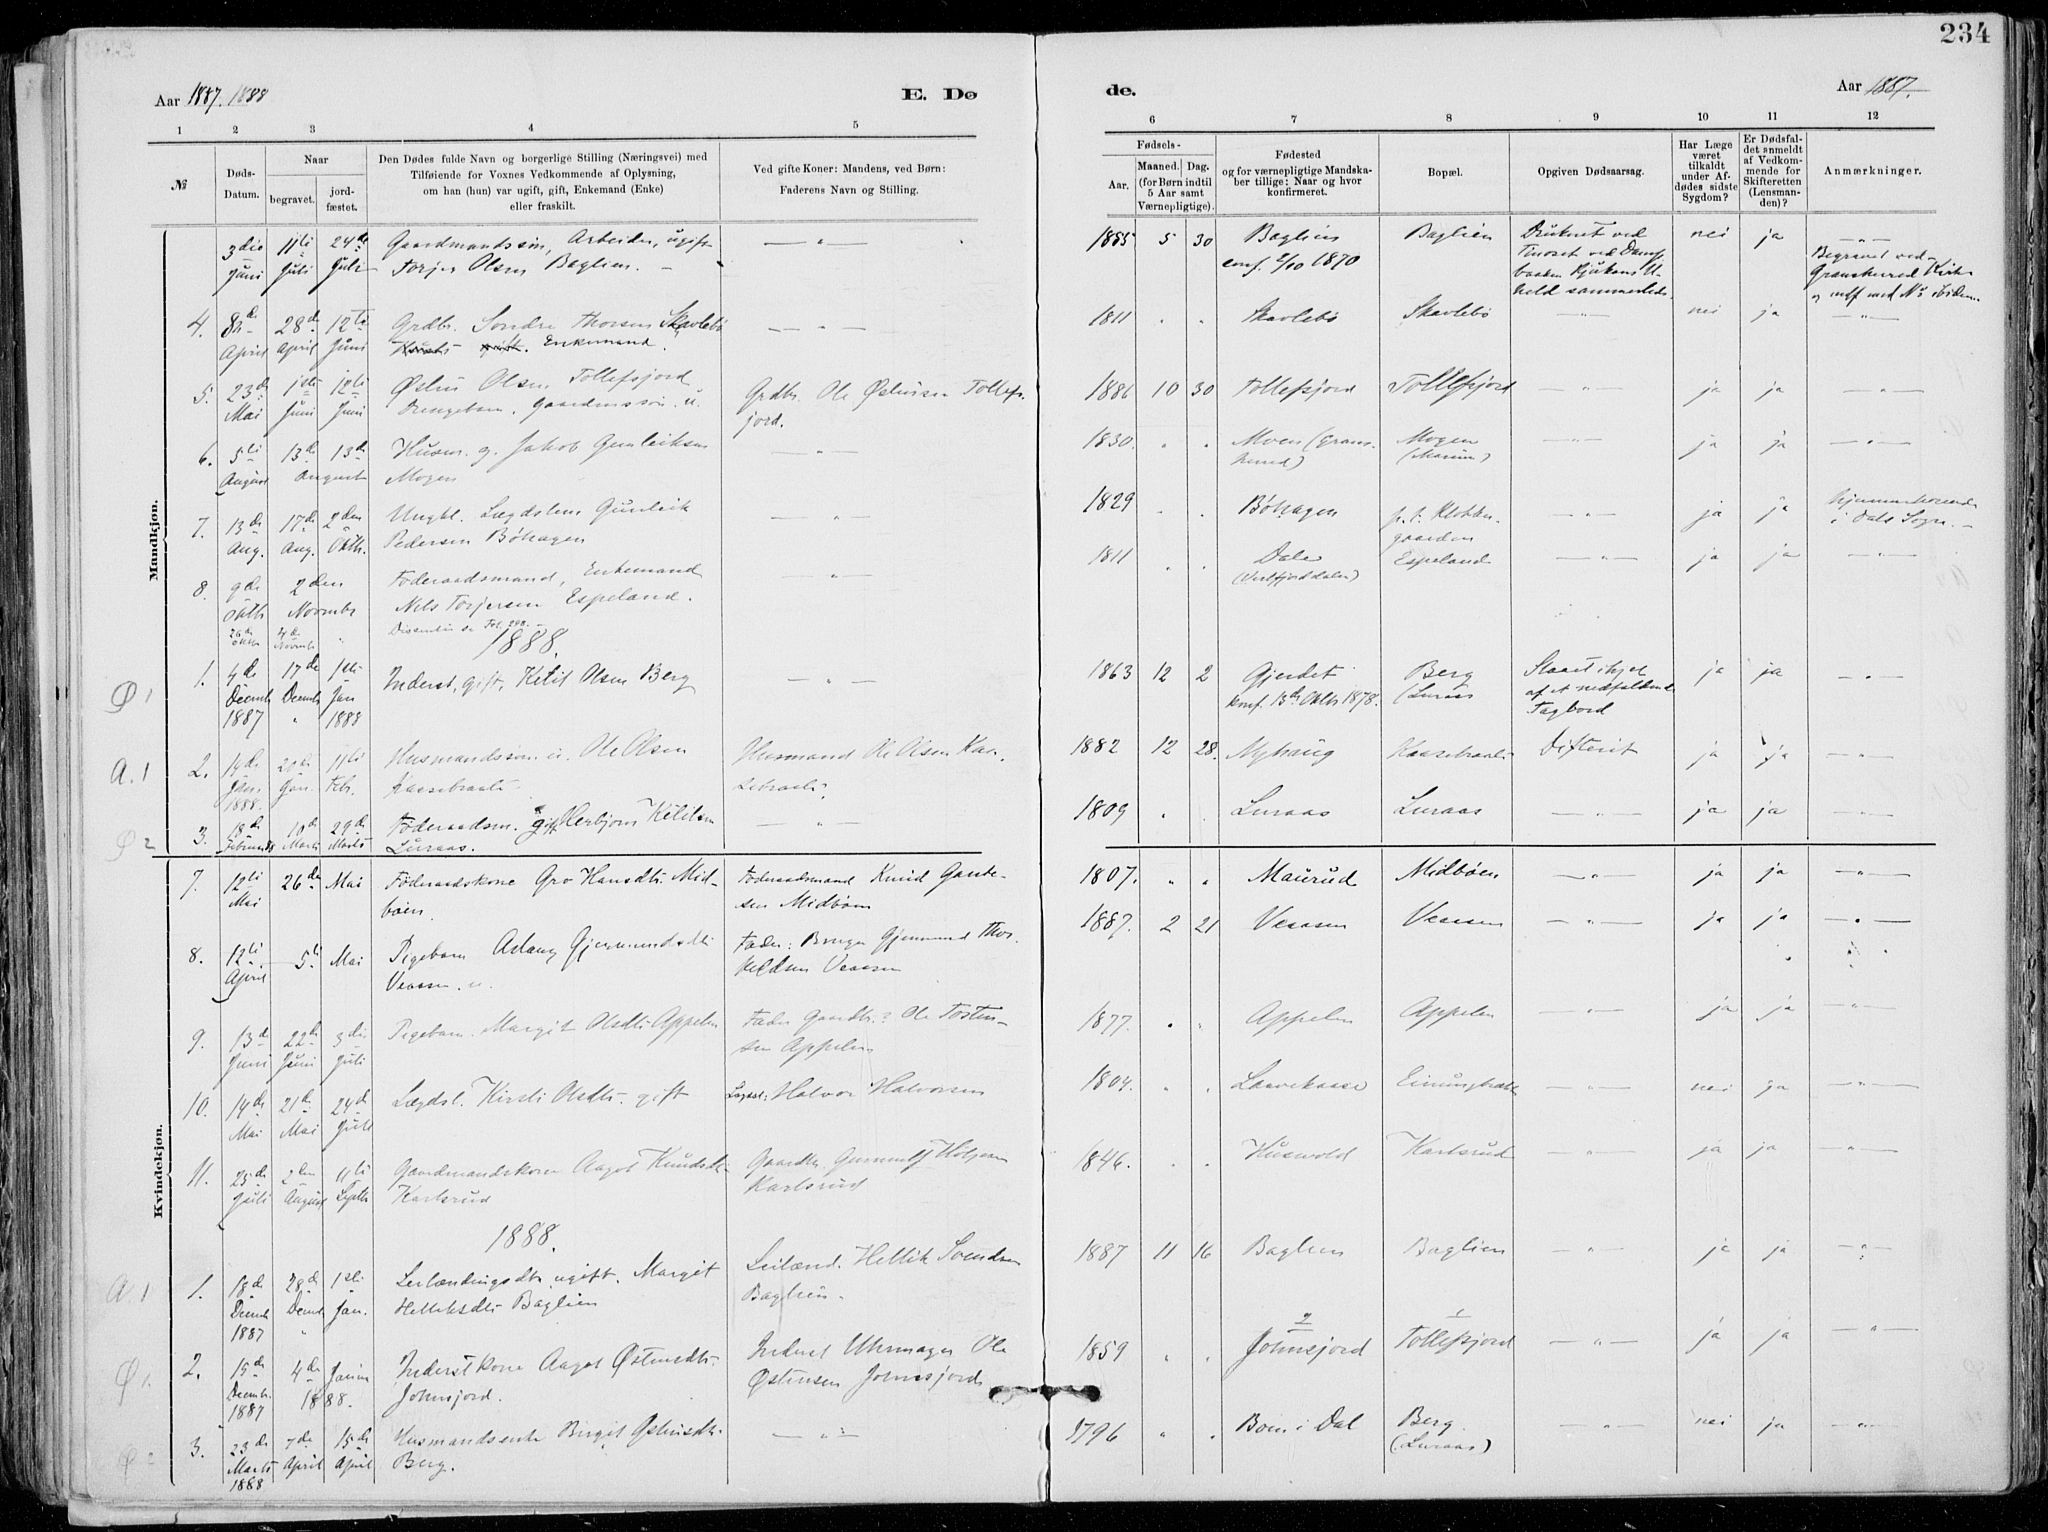 SAKO, Tinn kirkebøker, F/Fa/L0007: Ministerialbok nr. I 7, 1878-1922, s. 234